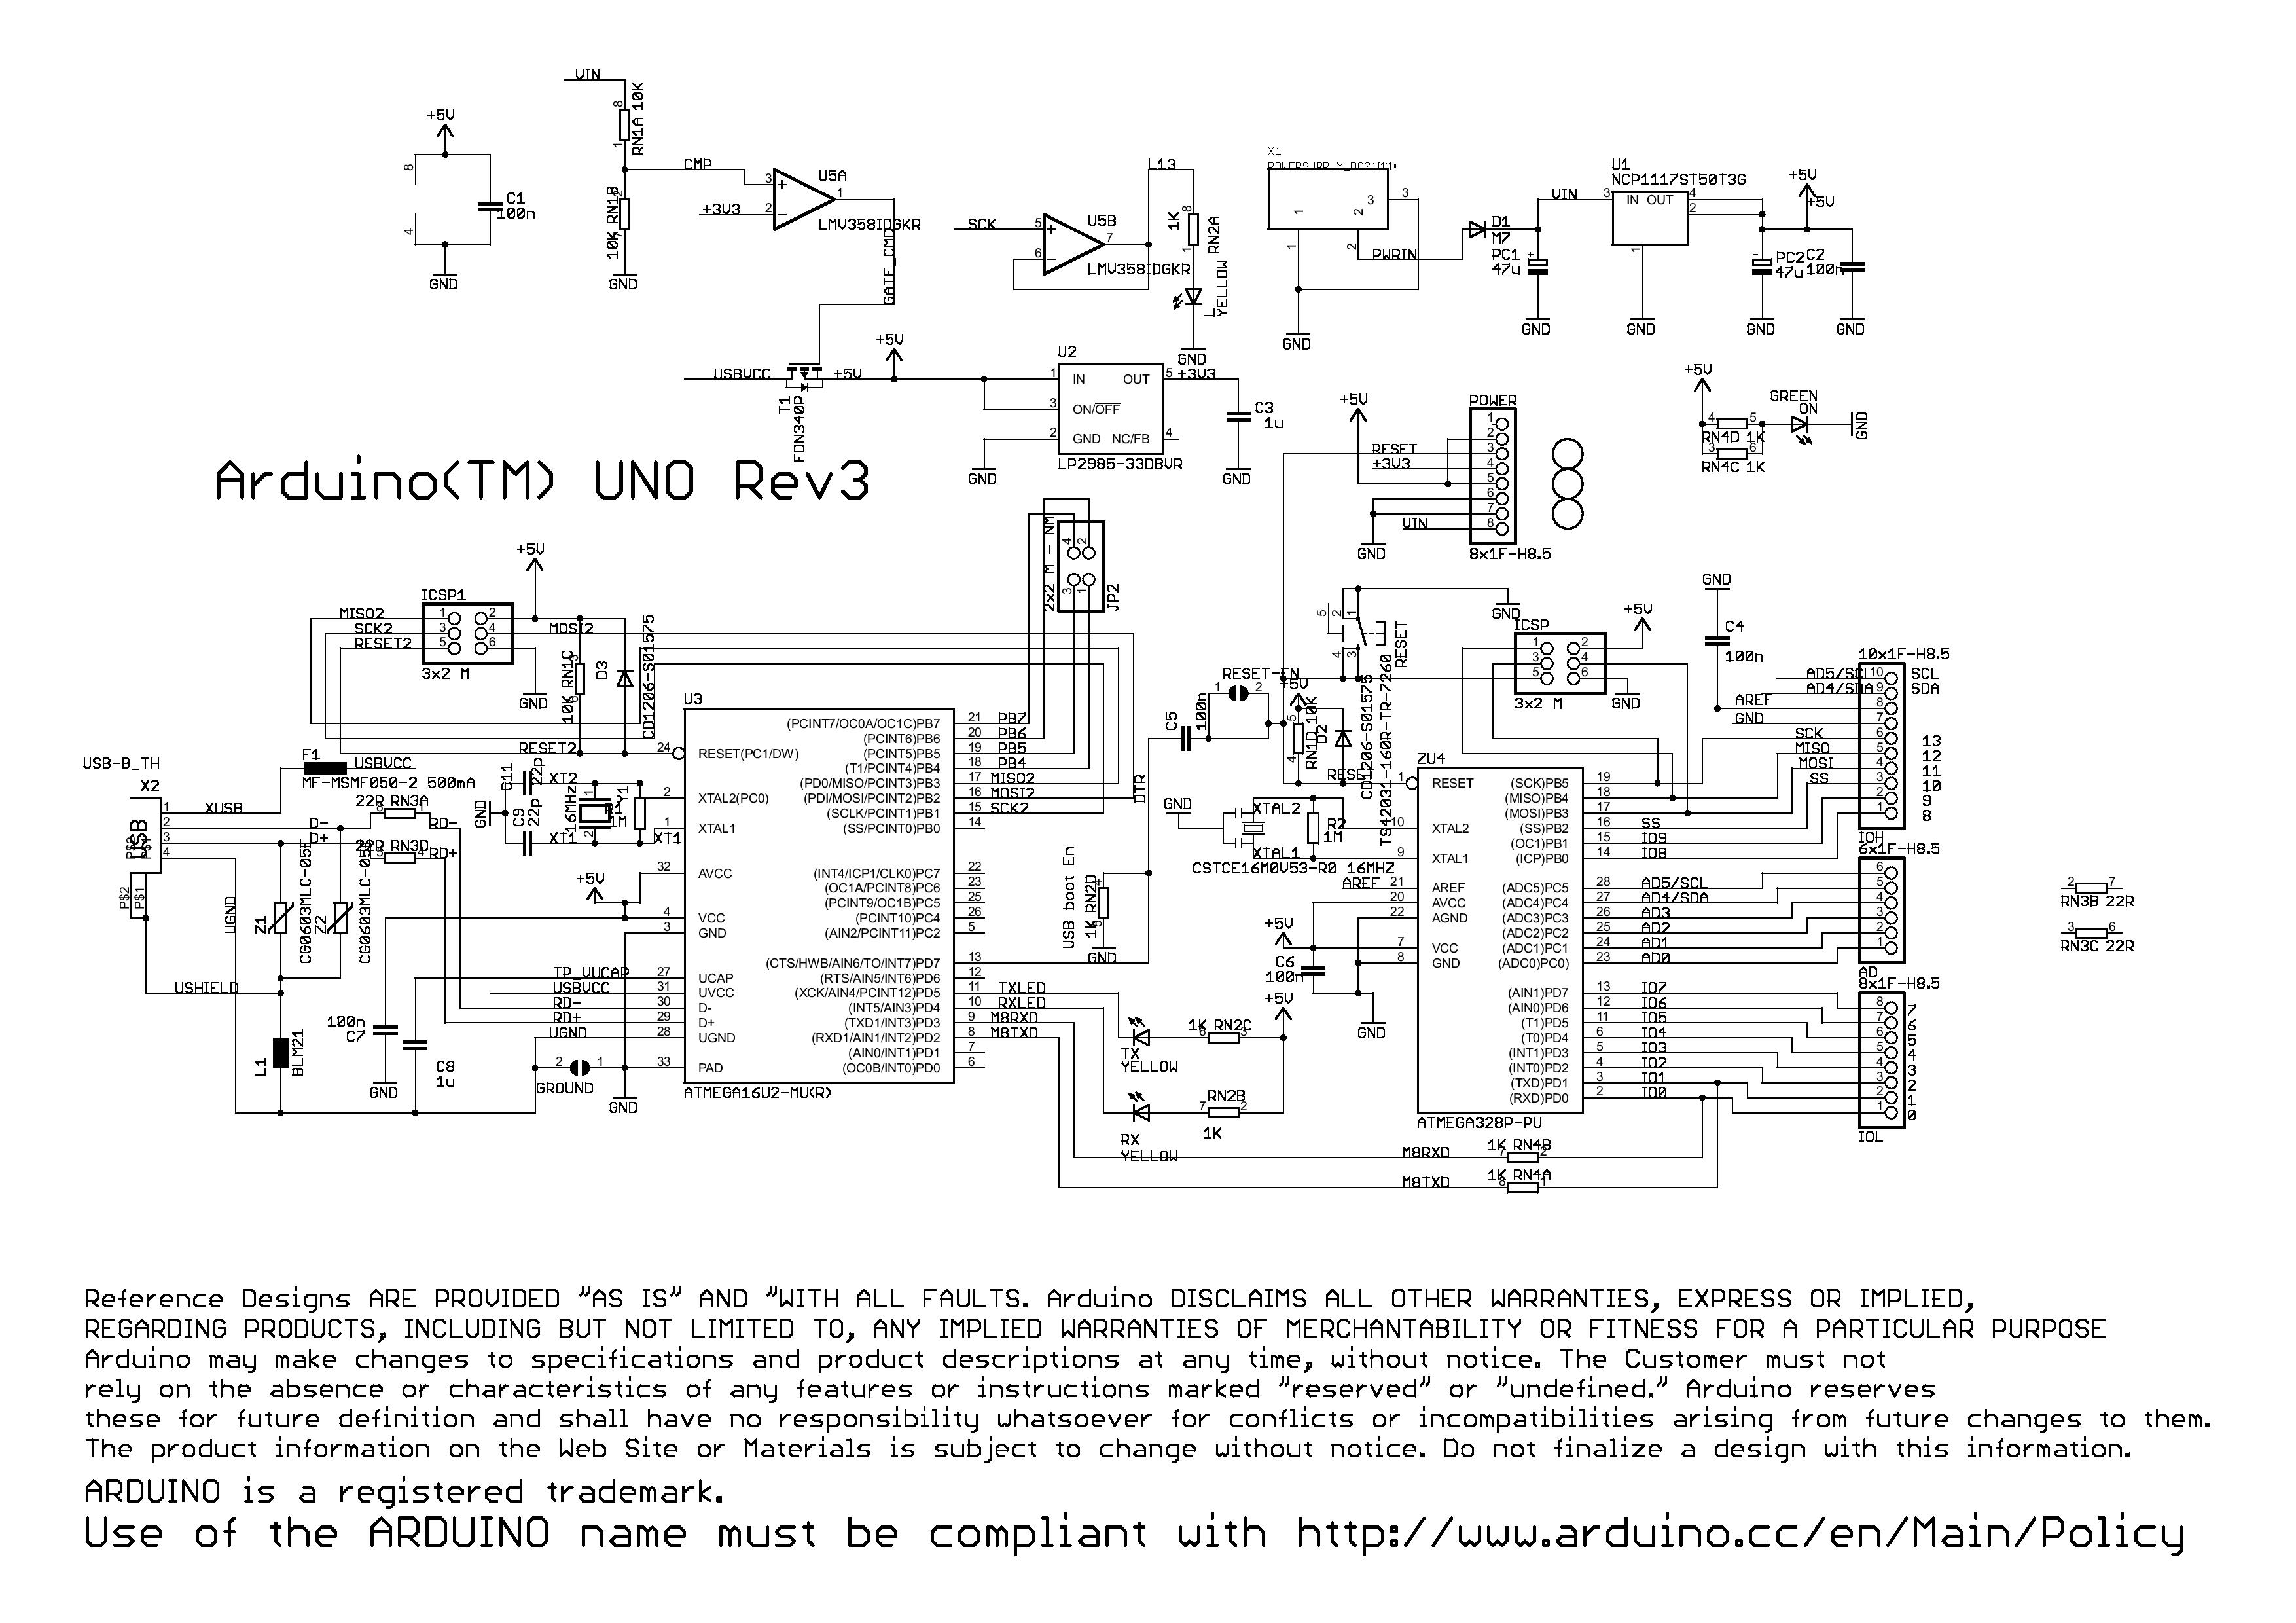 Arduino Uno Circuit | Wiring Diagram on arduino transistor, flash circuit schematic, iphone circuit schematic, mbed circuit schematic, arduino dmx controller, arduino amplifier, arduino pcb layout,